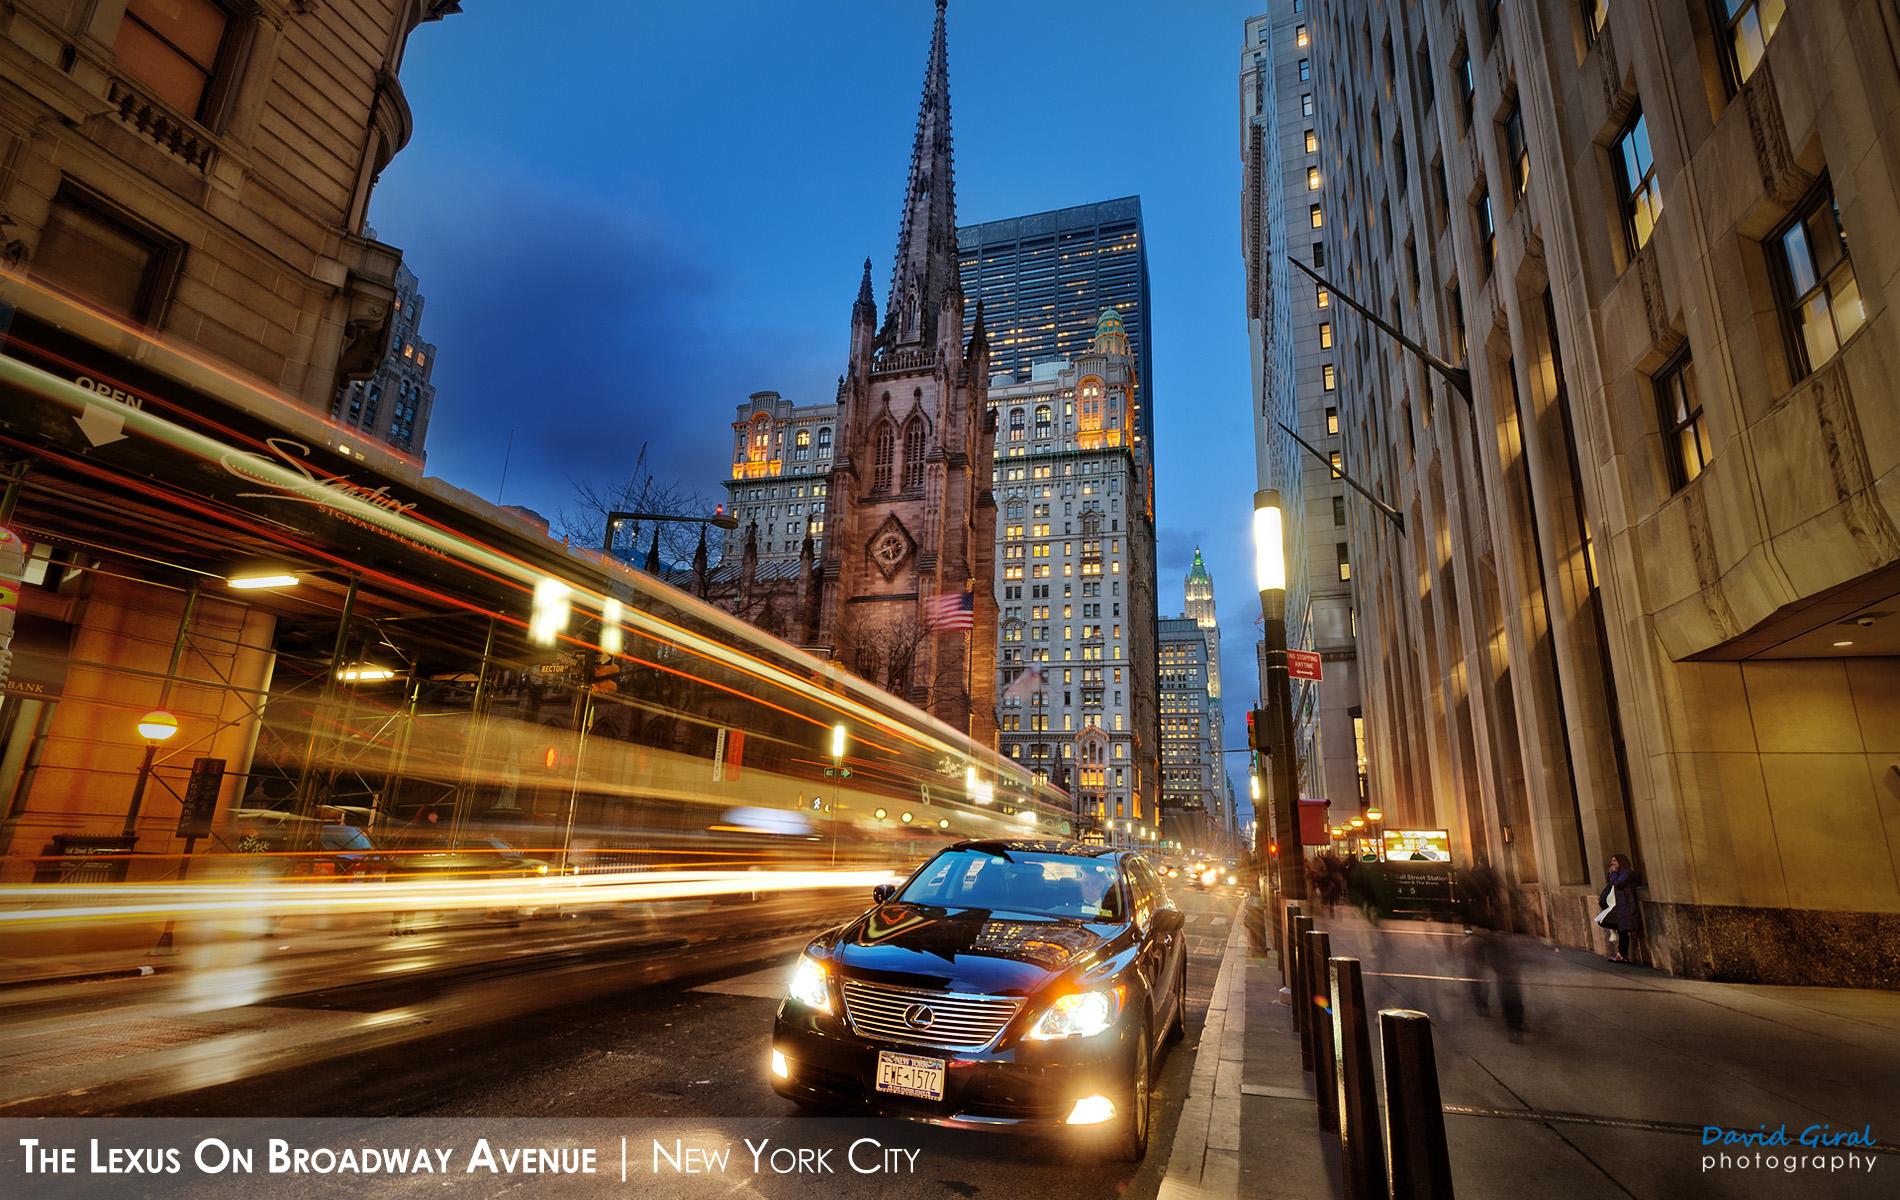 Making The Lexus on Broadway Avenue New York City